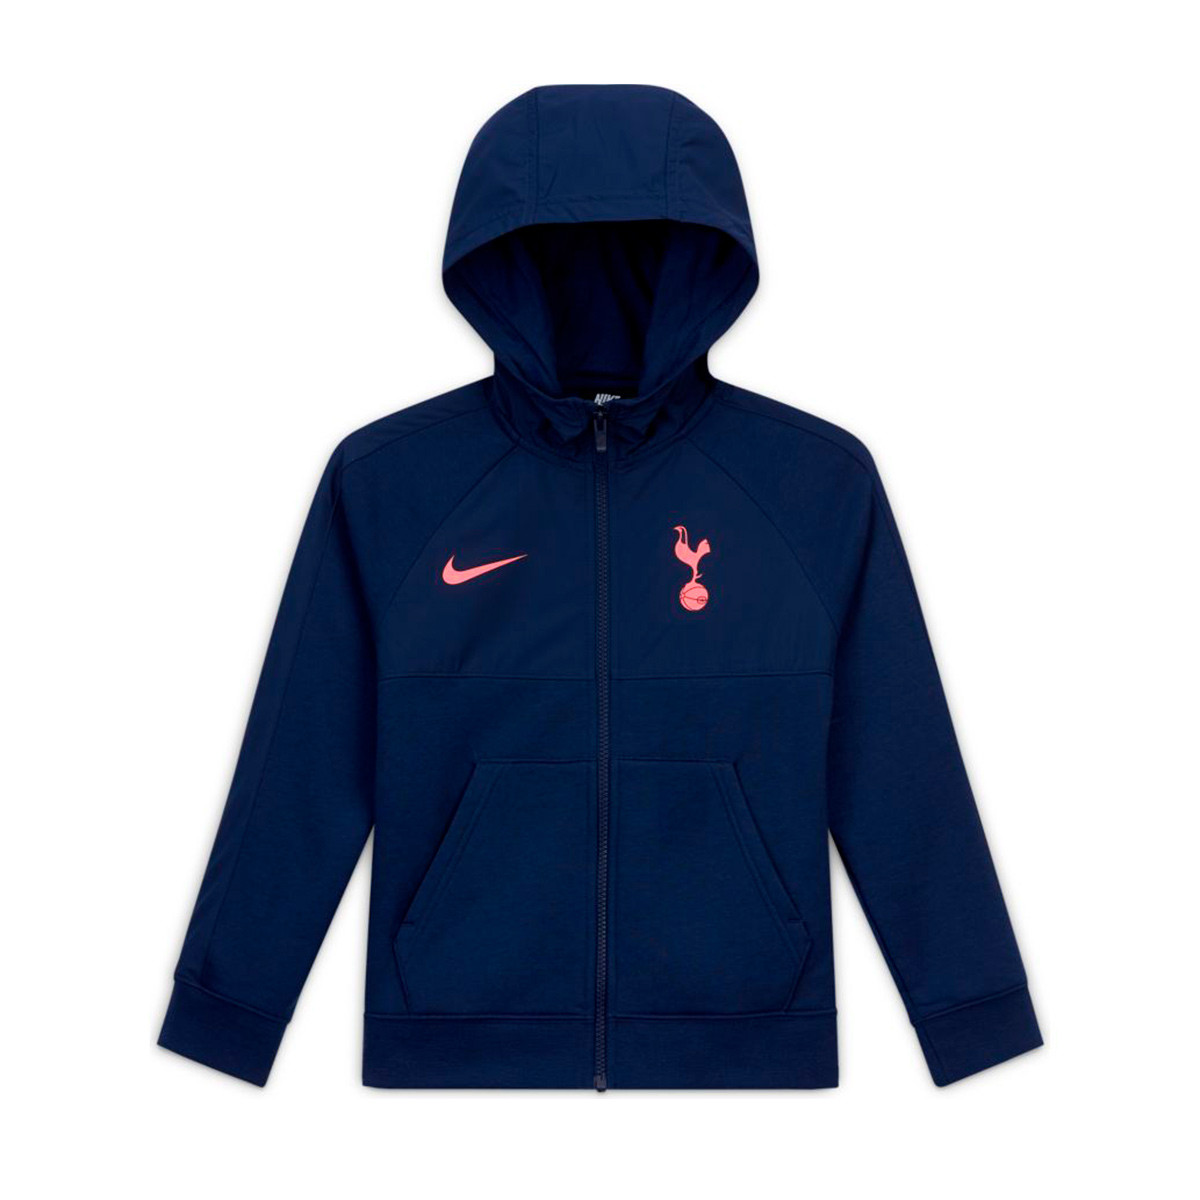 Sweatshirt Nike Tottenham Hotspur Fc Nsw Hybrid Fz 2020 2021 Nino Binary Blue Lava Glow Football Store Futbol Emotion